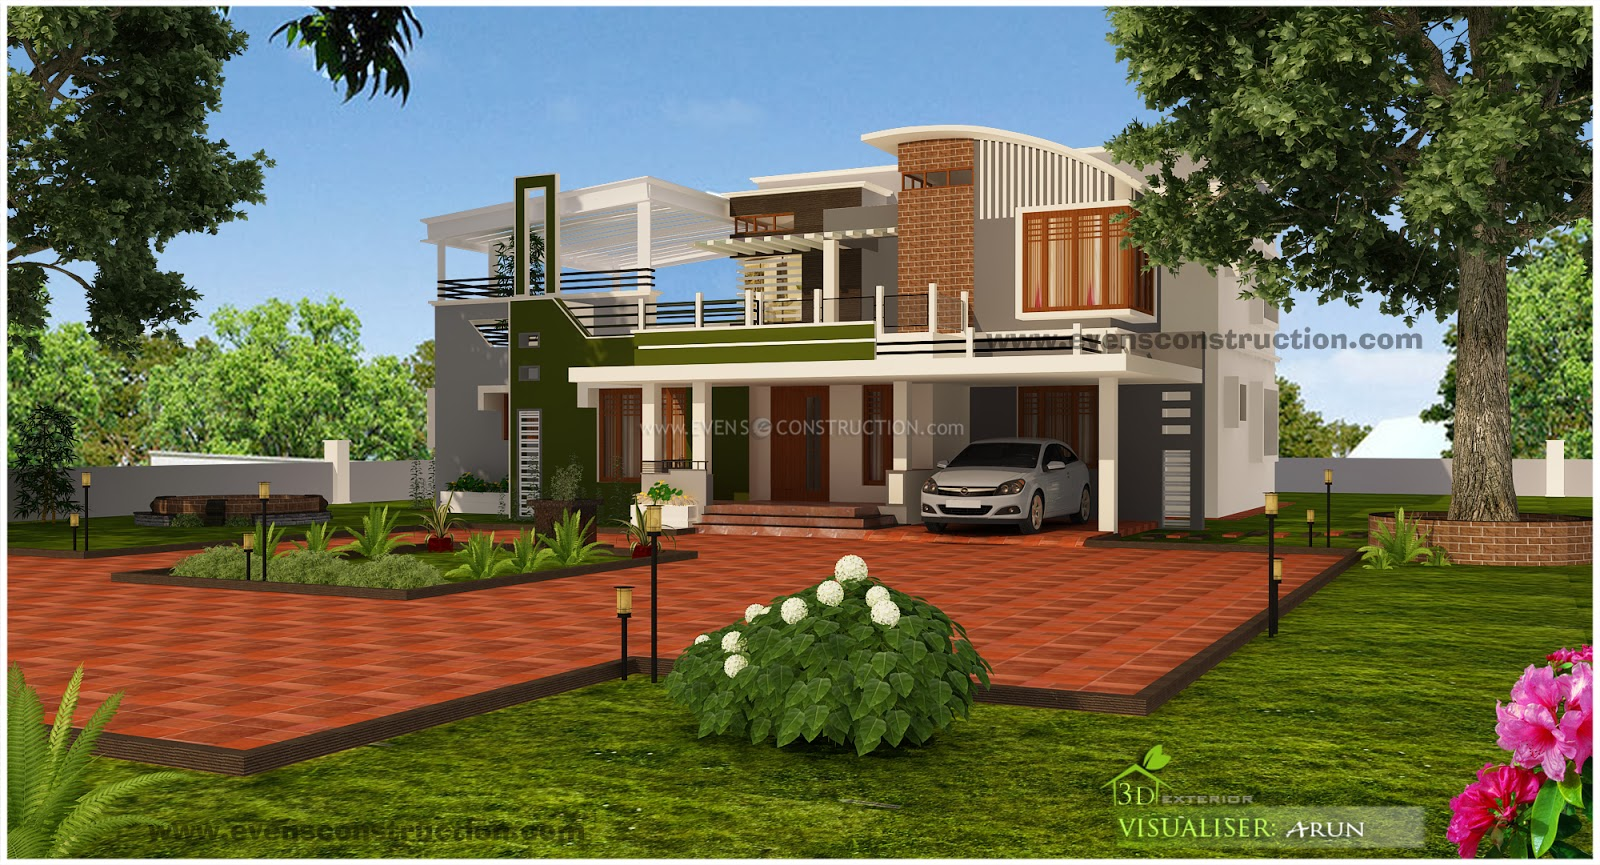 Evens Construction Pvt Ltd Recent Projects